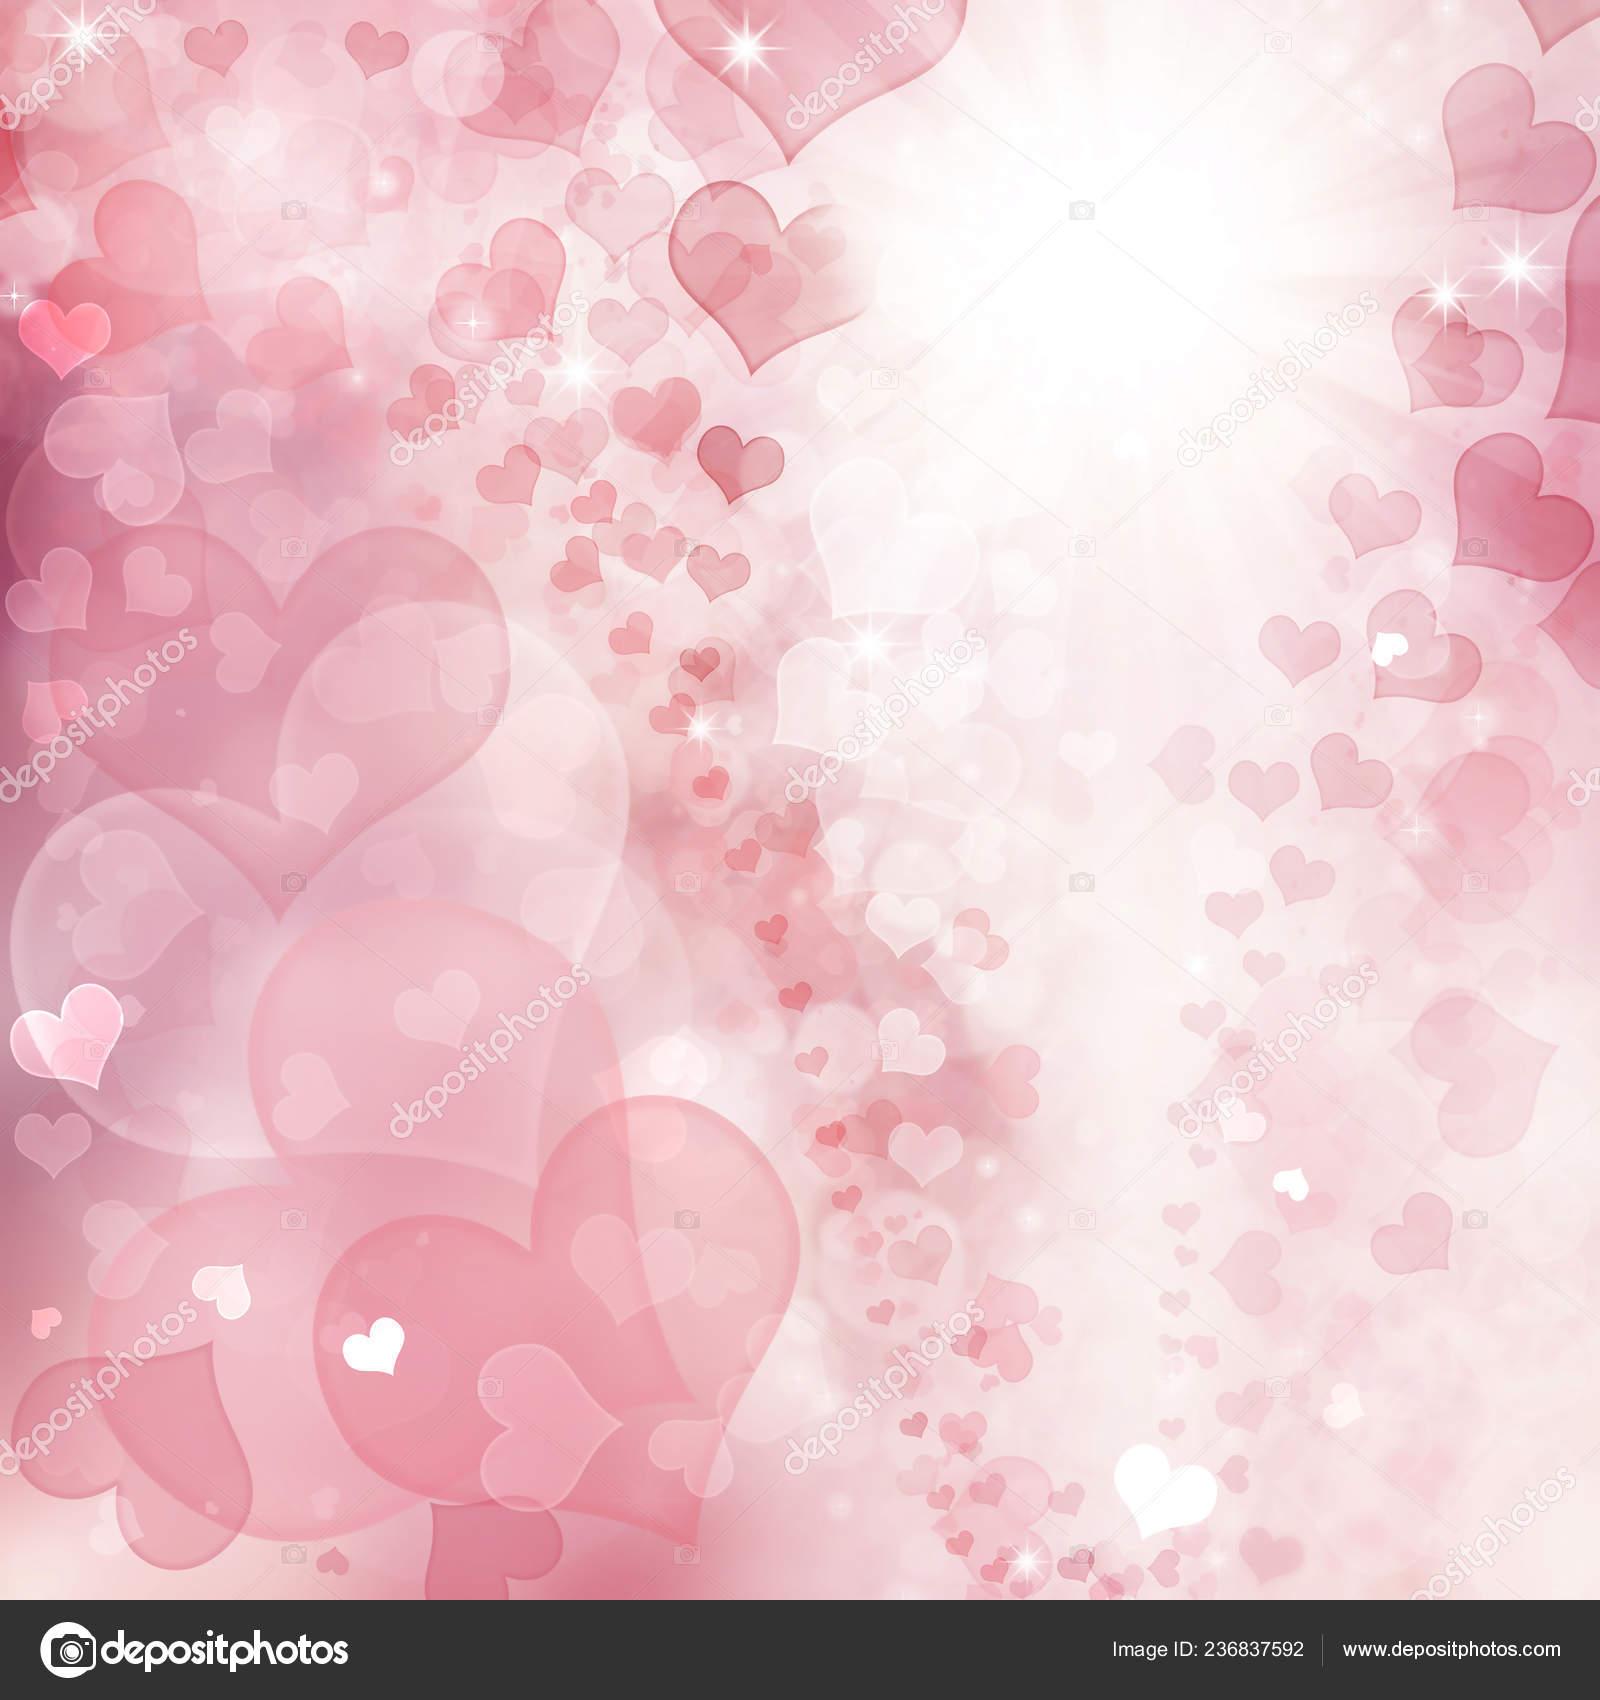 Valentine Hearts Abstract Pink Background Valentine Day